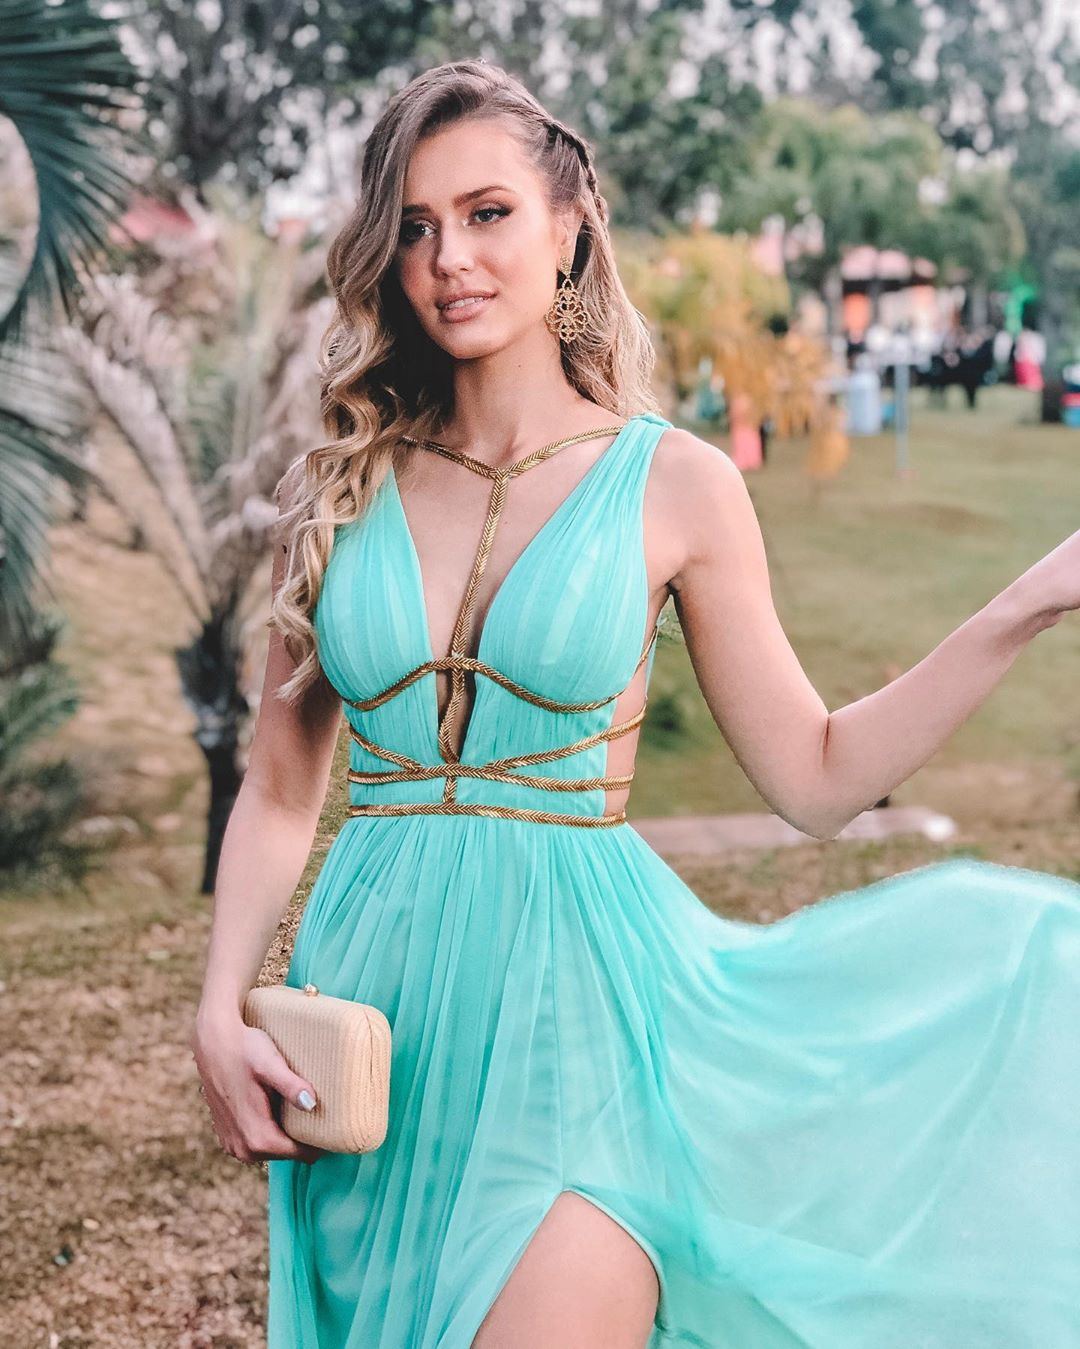 marcella kozinski de barros, 3rd runner-up de miss tourism world 2019. 67422210